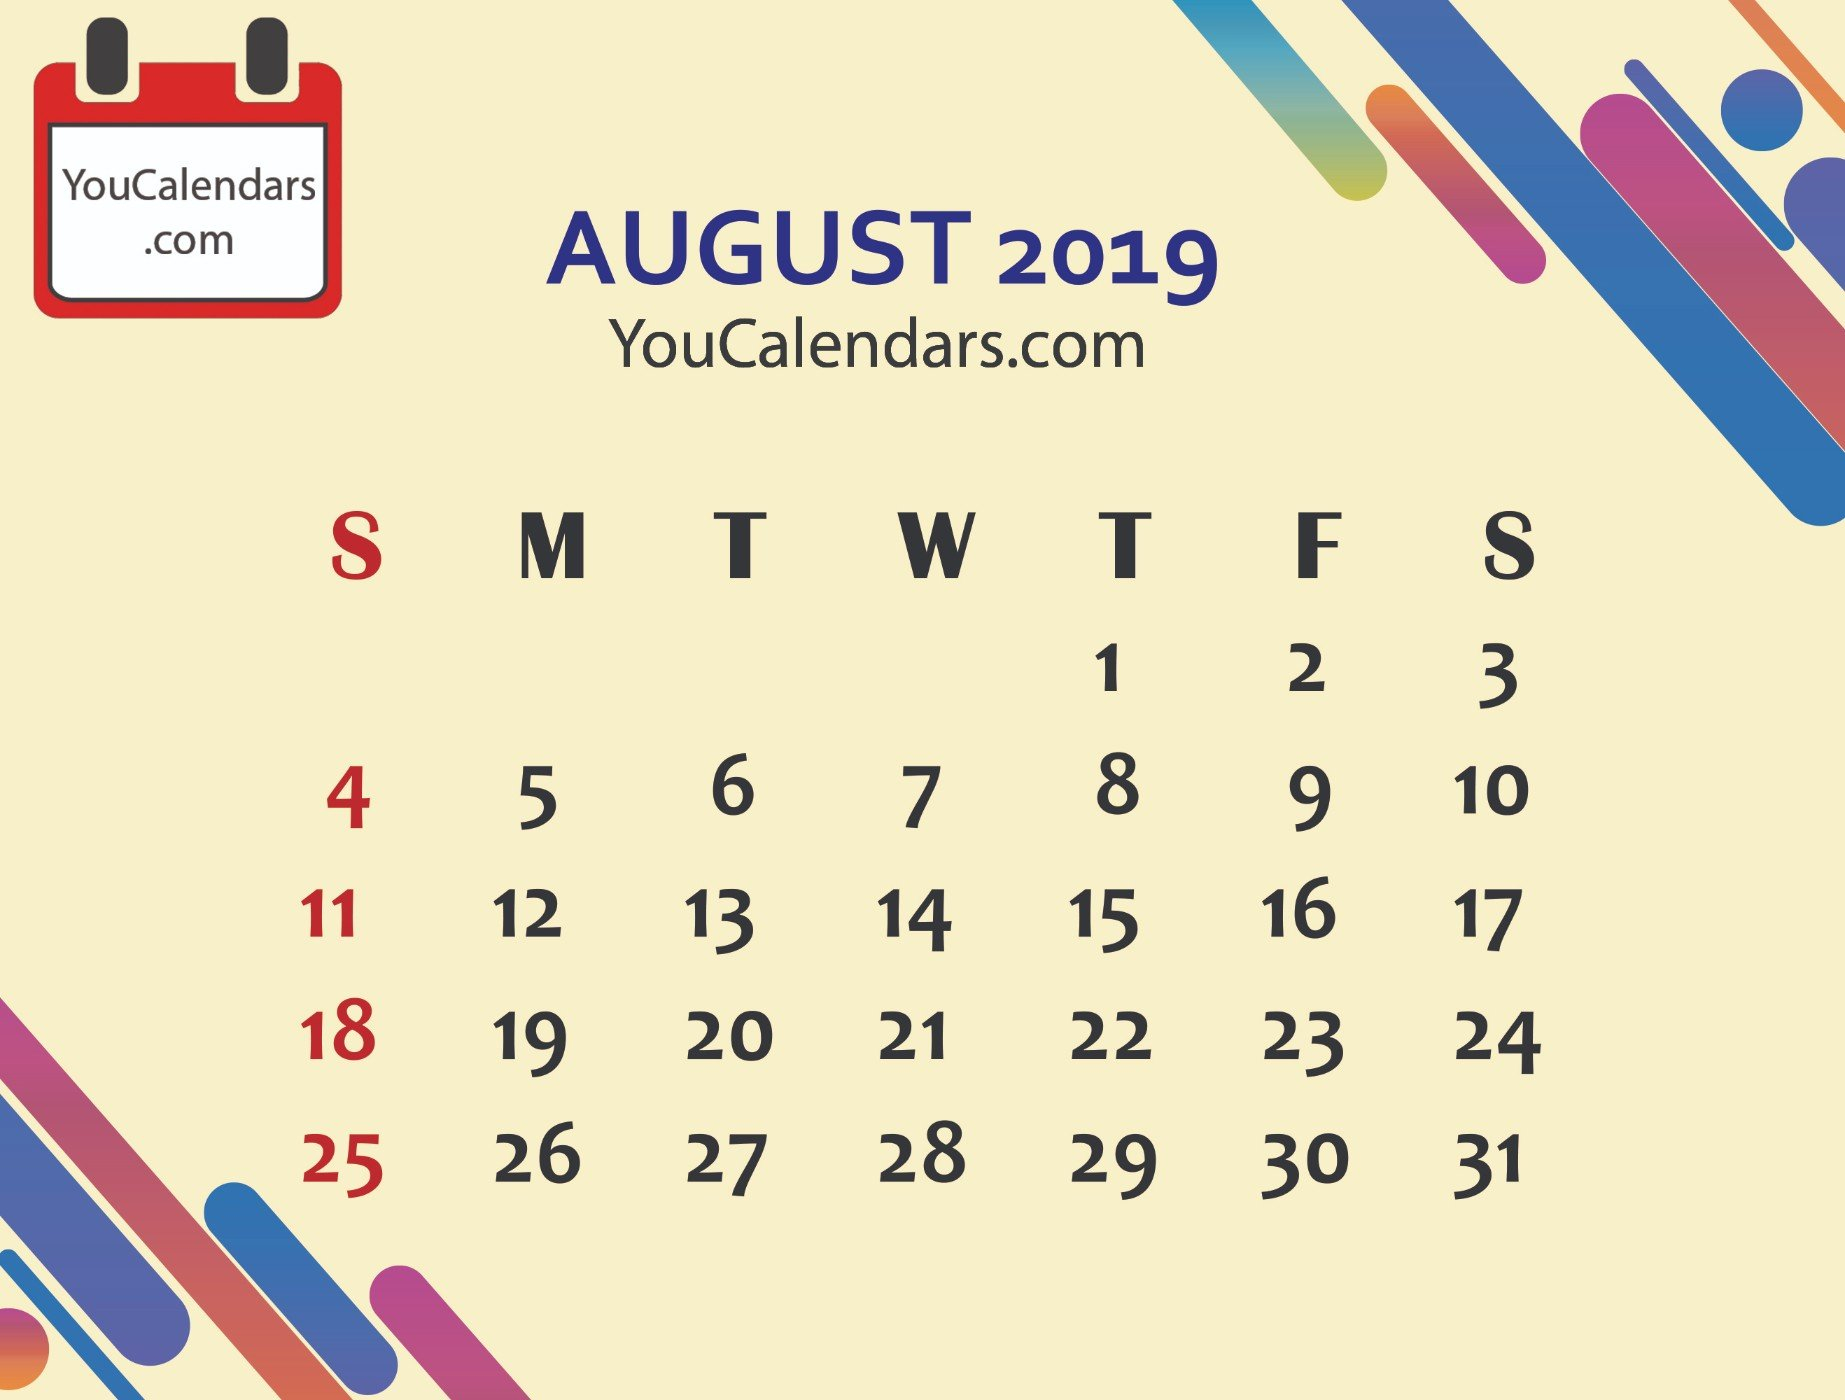 ✅Free August 2019 Calendar Printable Template – You Calendars August 9 2019 Calendar